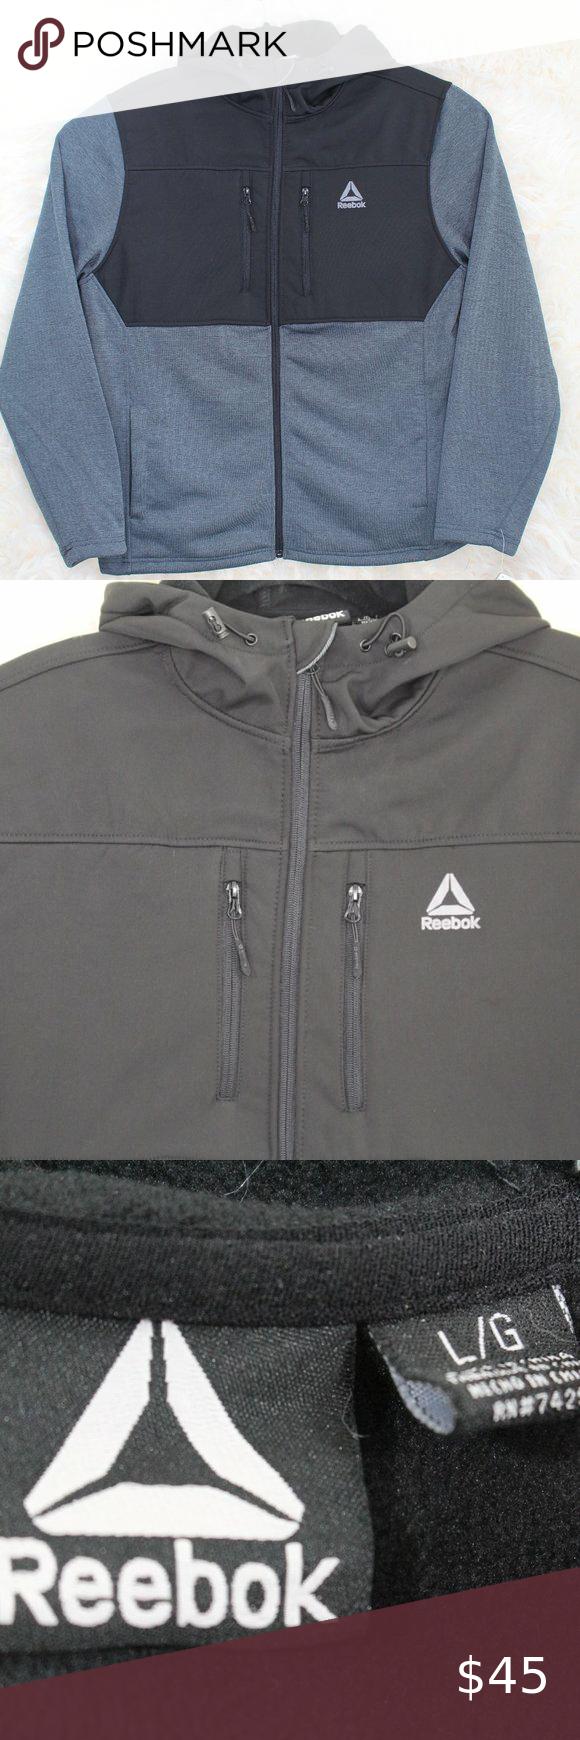 Reebok Men S Softshell Swacket Jacket Jackets Outerwear Jackets Softshell [ 1740 x 580 Pixel ]